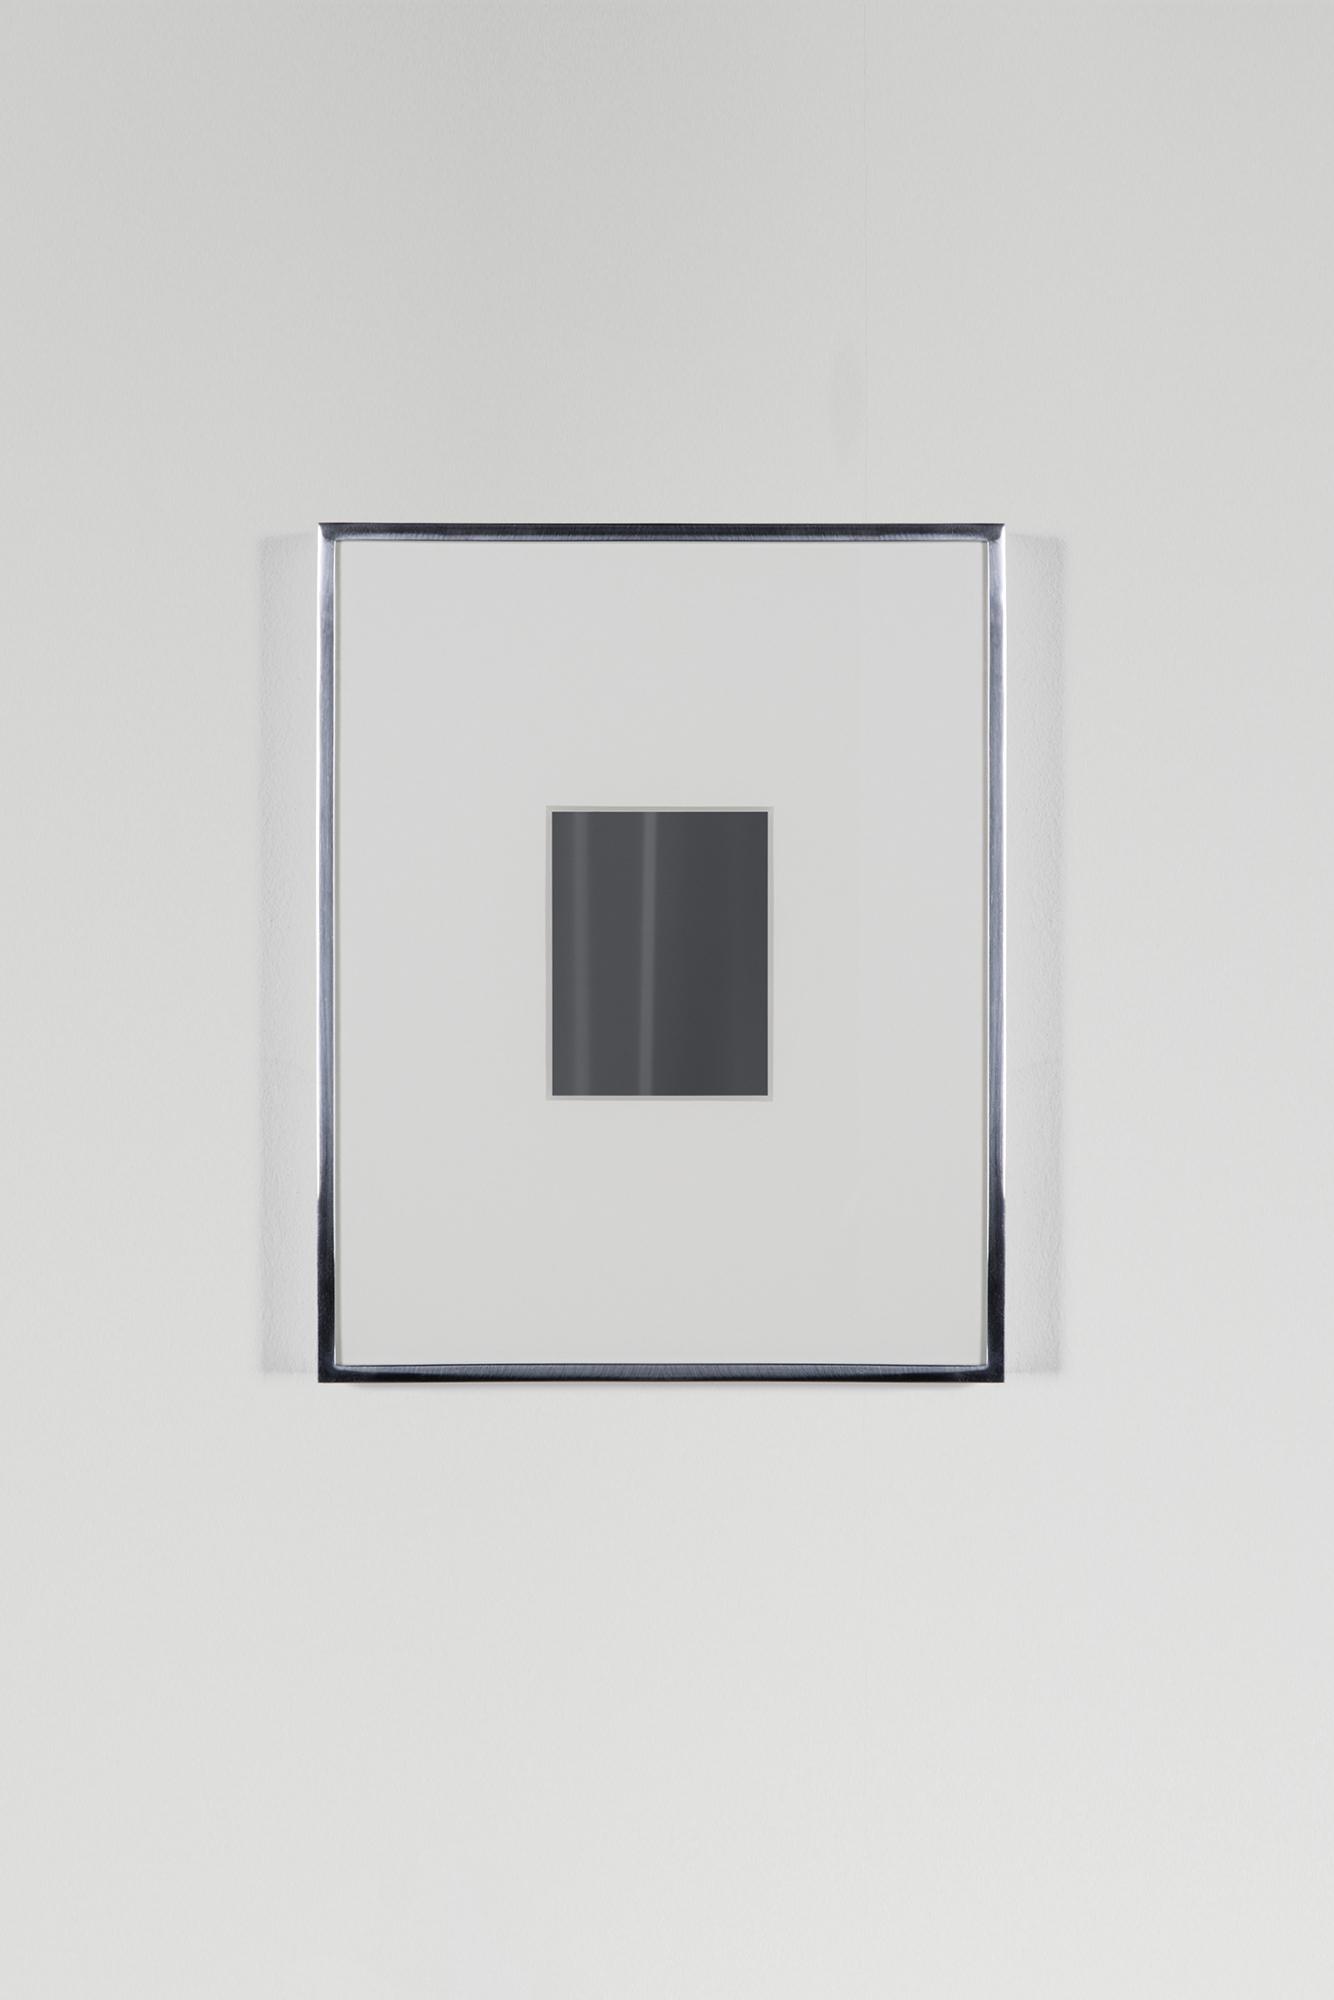 Transparency (Negative) [Kodak Portra 400NC Em. No. 1022: May 1–9, 2016 LAX/JFK EWR/LAX]    2017   Epson Ultrachrome K3 archival ink jet print on Museo Silver Rag Paper  14 x 11 inches   Transparencies, 2014–